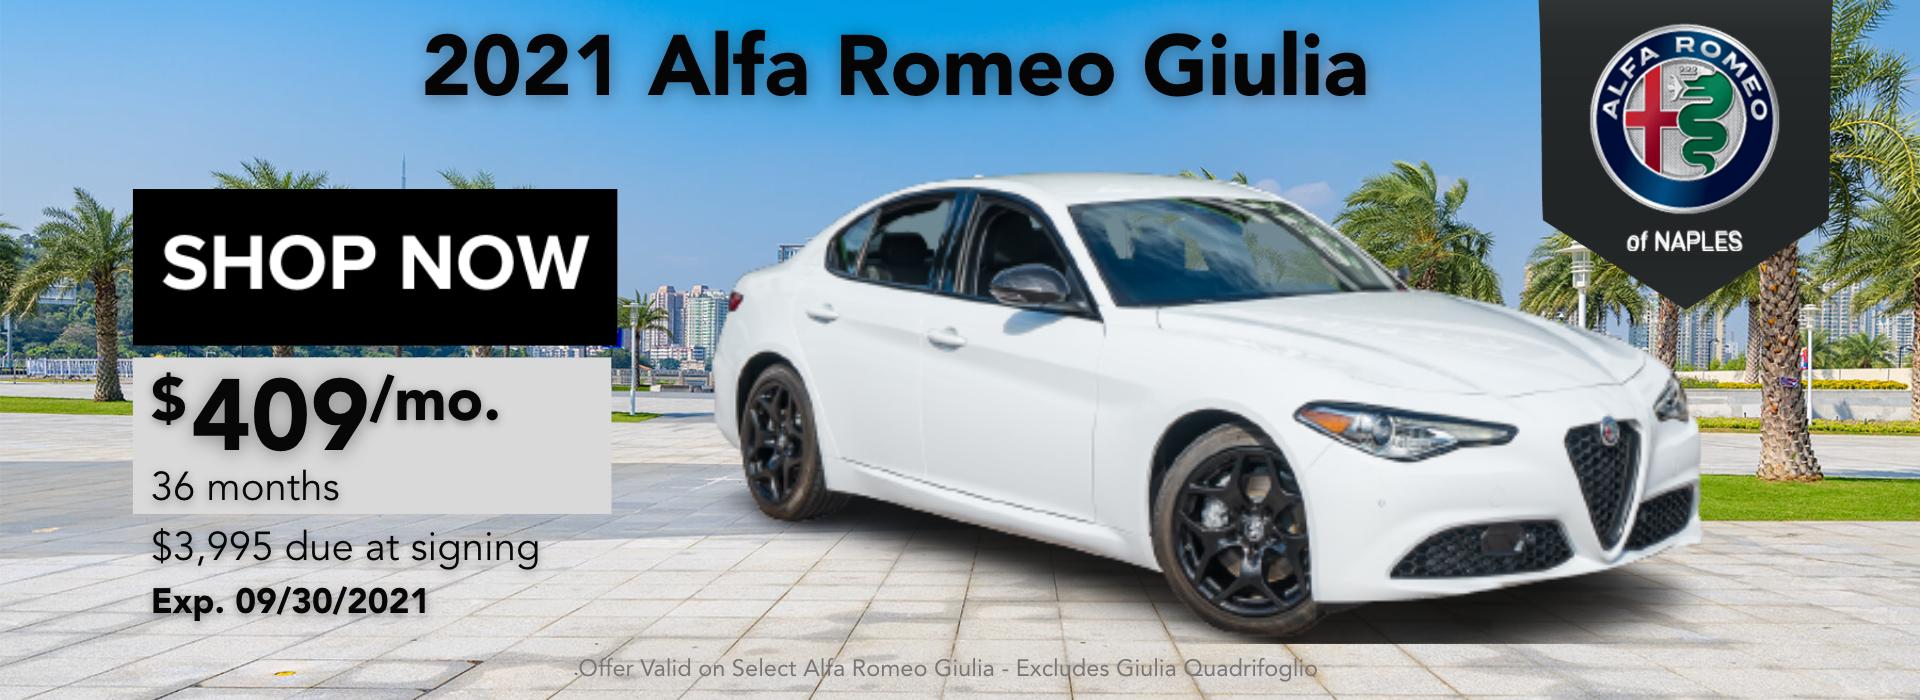 2021_Alfa Romeo_Stelvio_Quadrifoglio_Sat Sep 04 2021 09_24_00 GMT-0400 (Eastern Daylight Time)